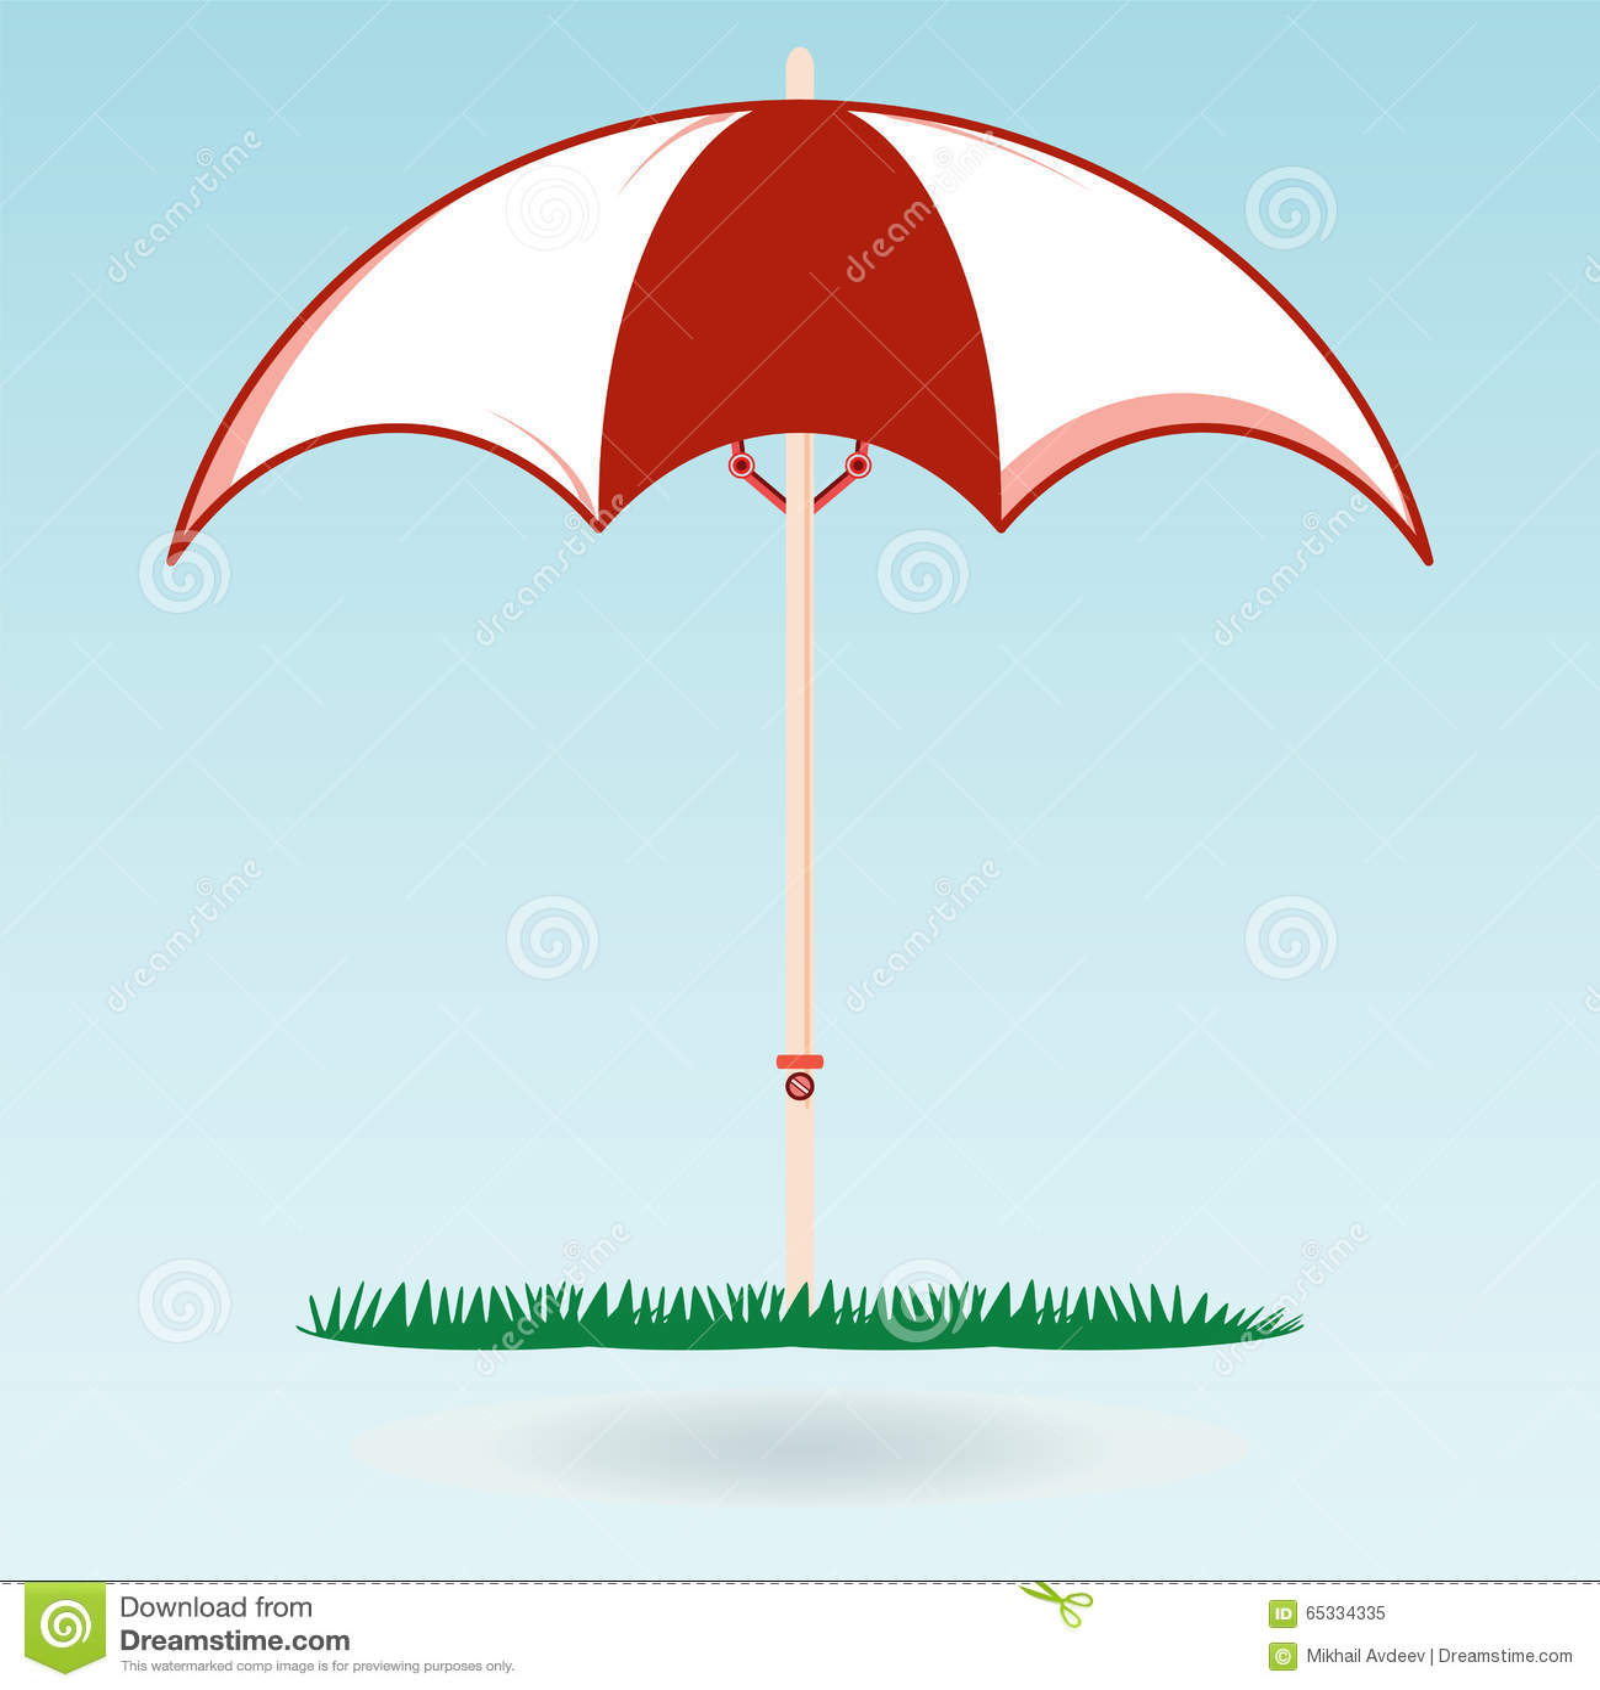 Beach umbrella on the green grass the symbol of the holiday stock beach umbrella on the green grass the symbol of the holiday biocorpaavc Choice Image